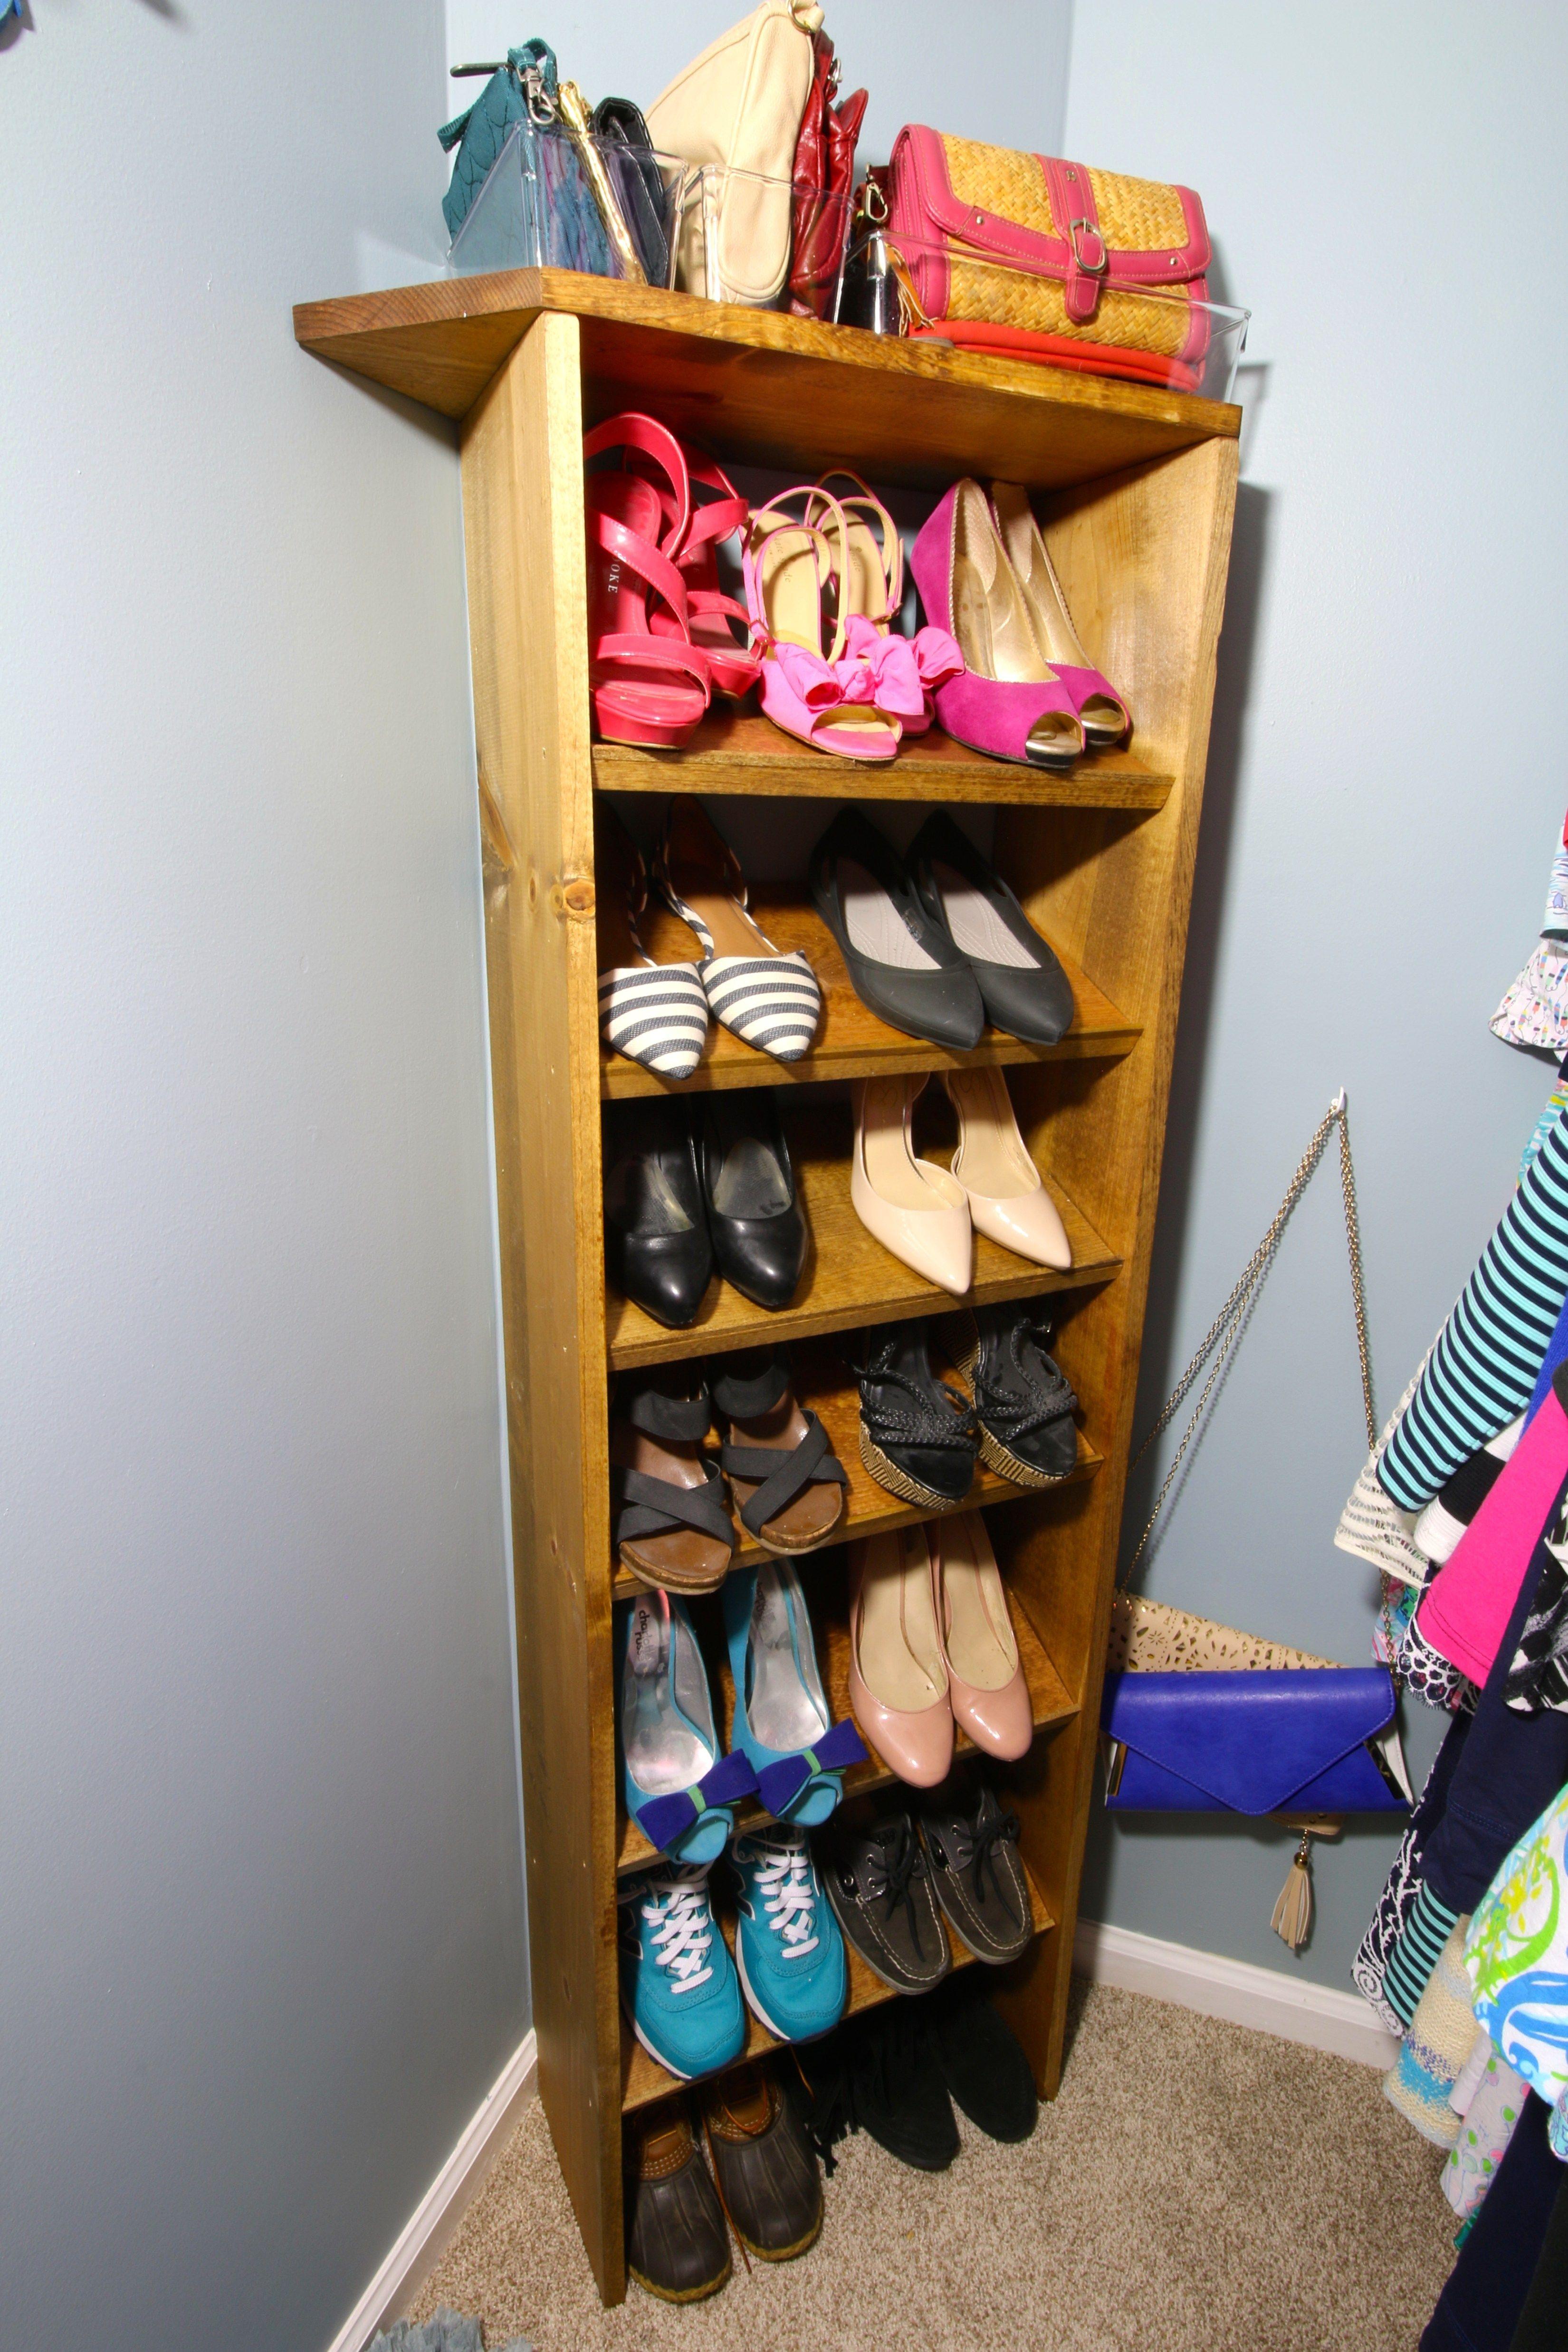 Orc Custom Wooden Shoe Handbag Storage Diy Shoe Rack Diy Storage Handbag Storage